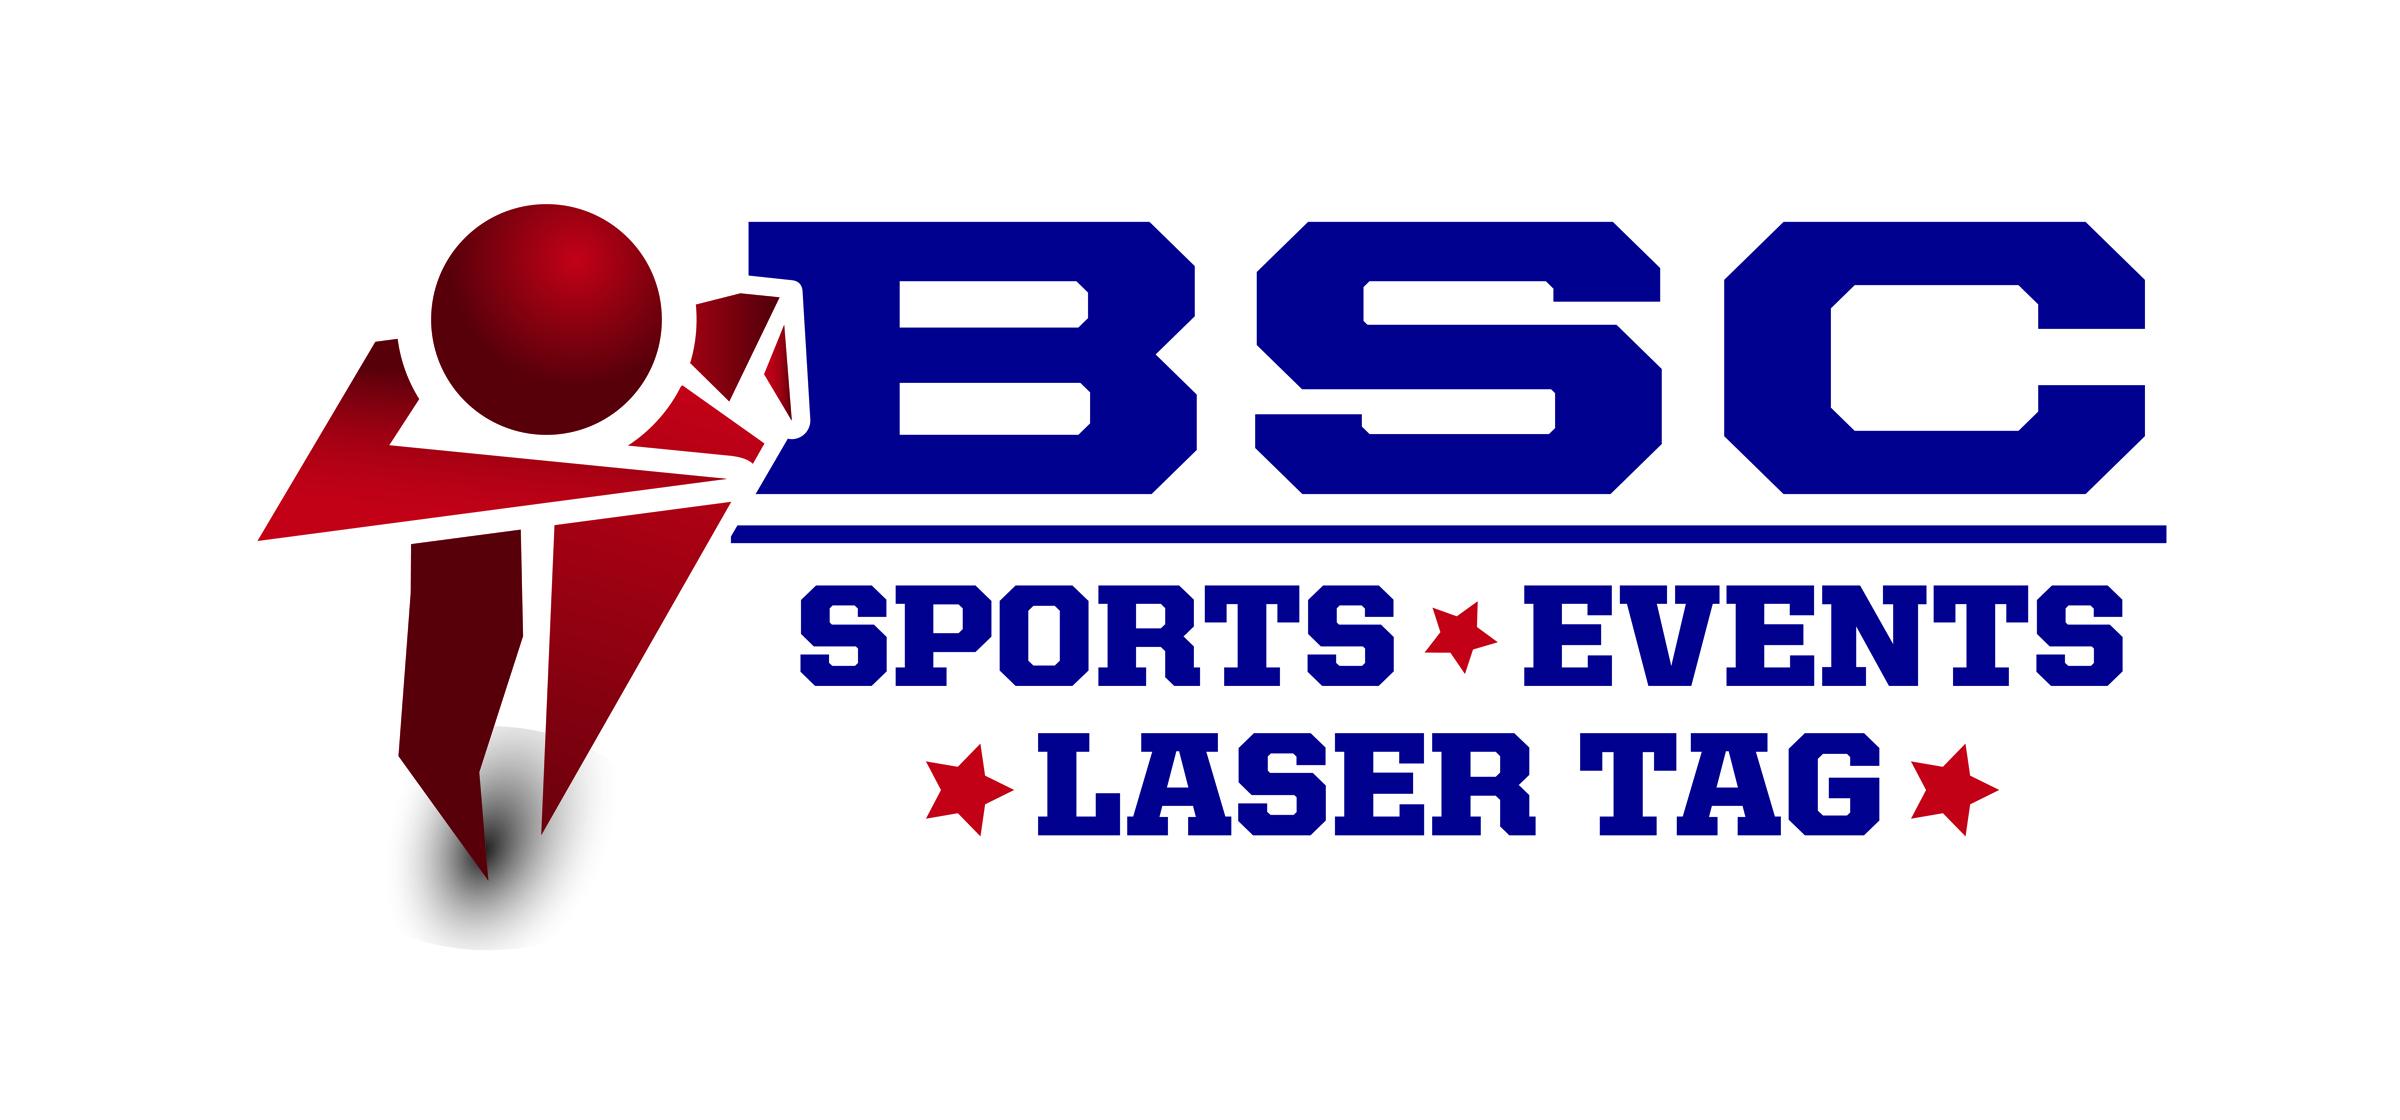 Branchburg Sports Complex- Fun Place to Go